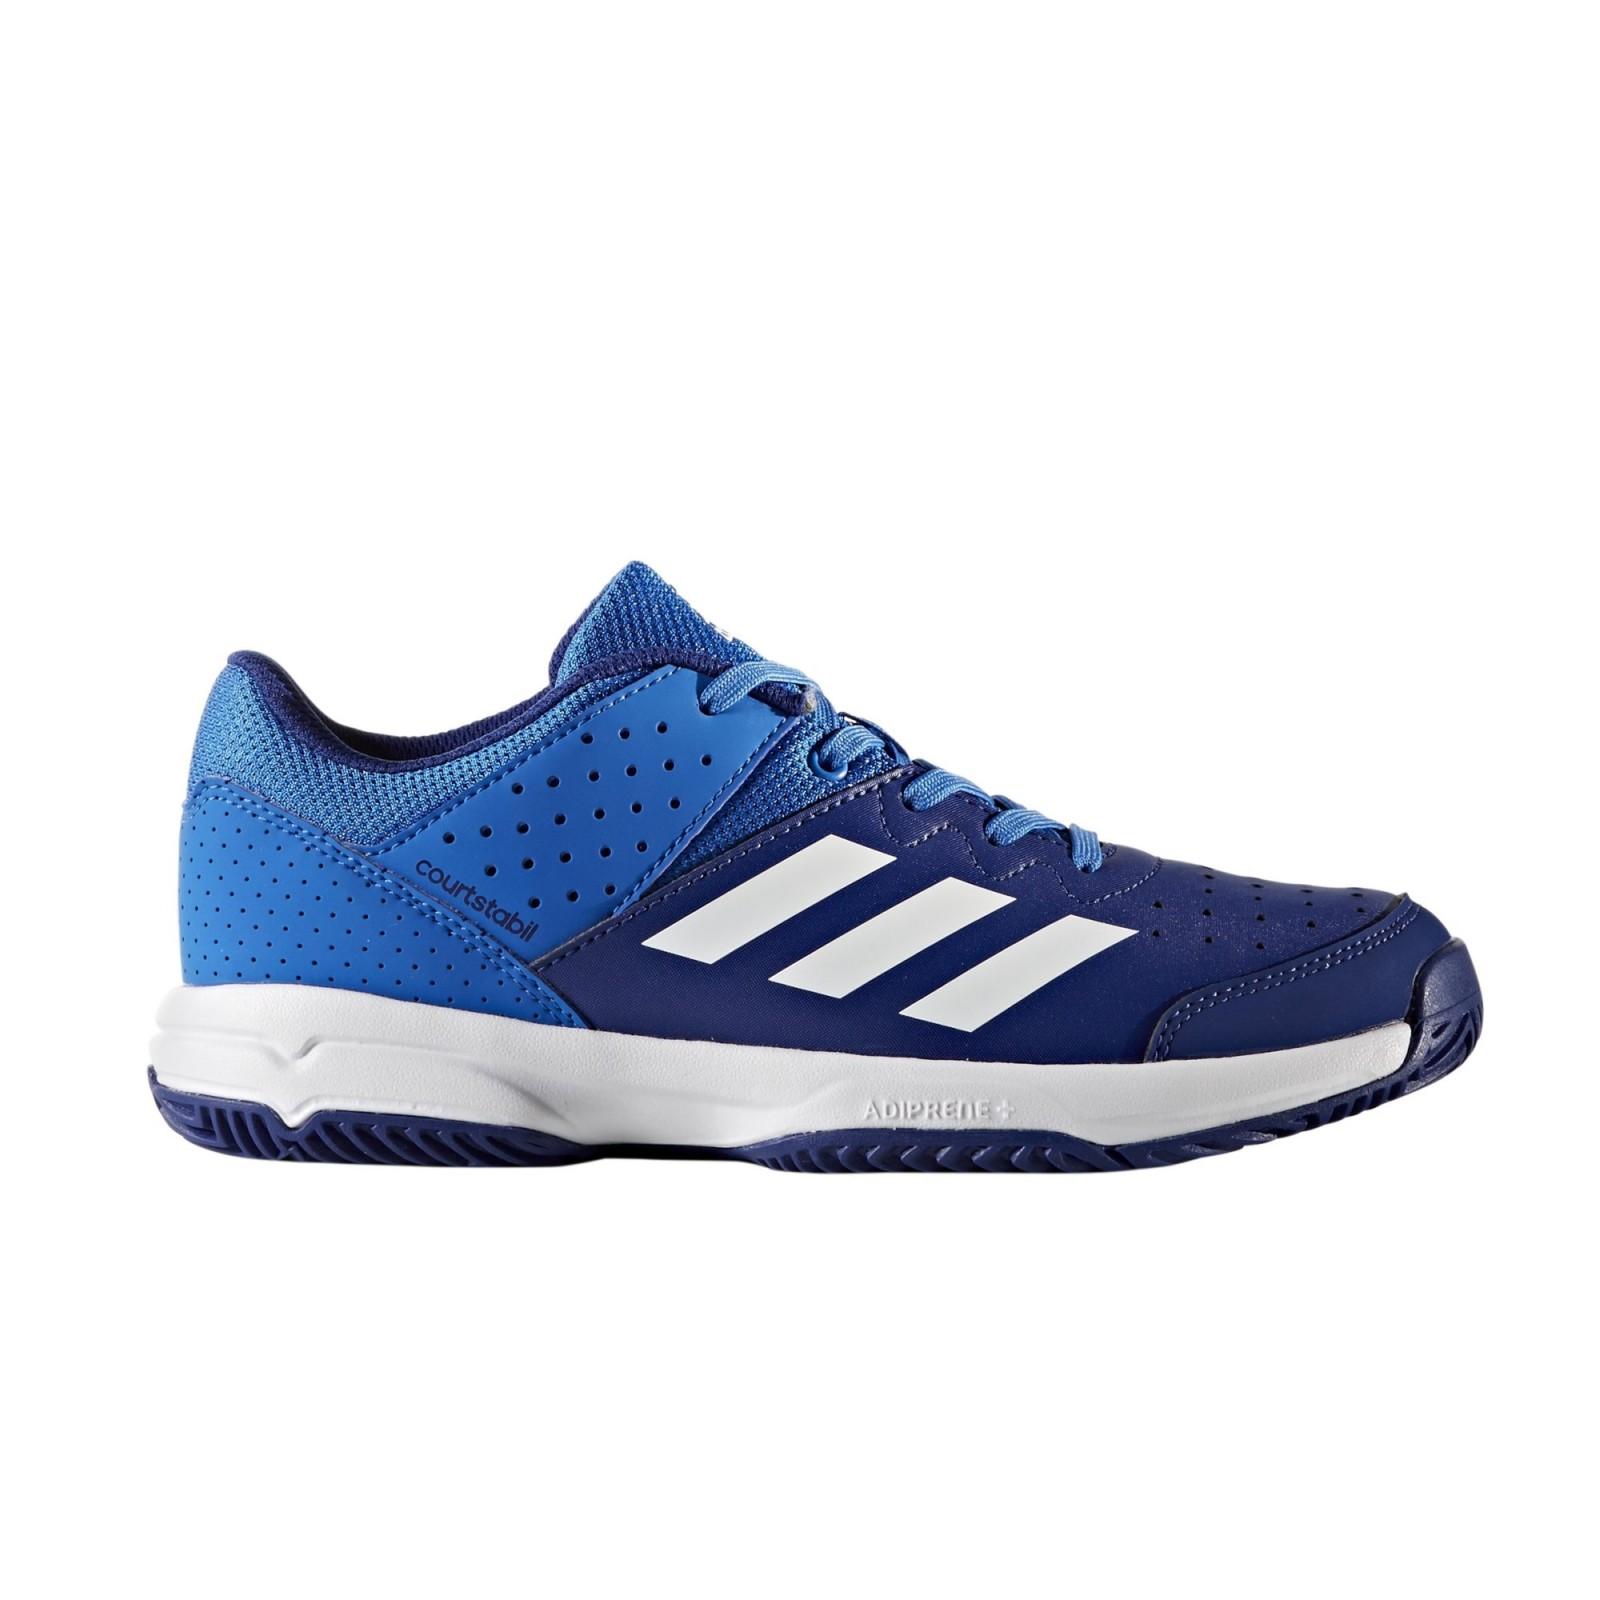 3c79da9e741 Dětská sálová obuv adidas Performance COURT STABIL JR